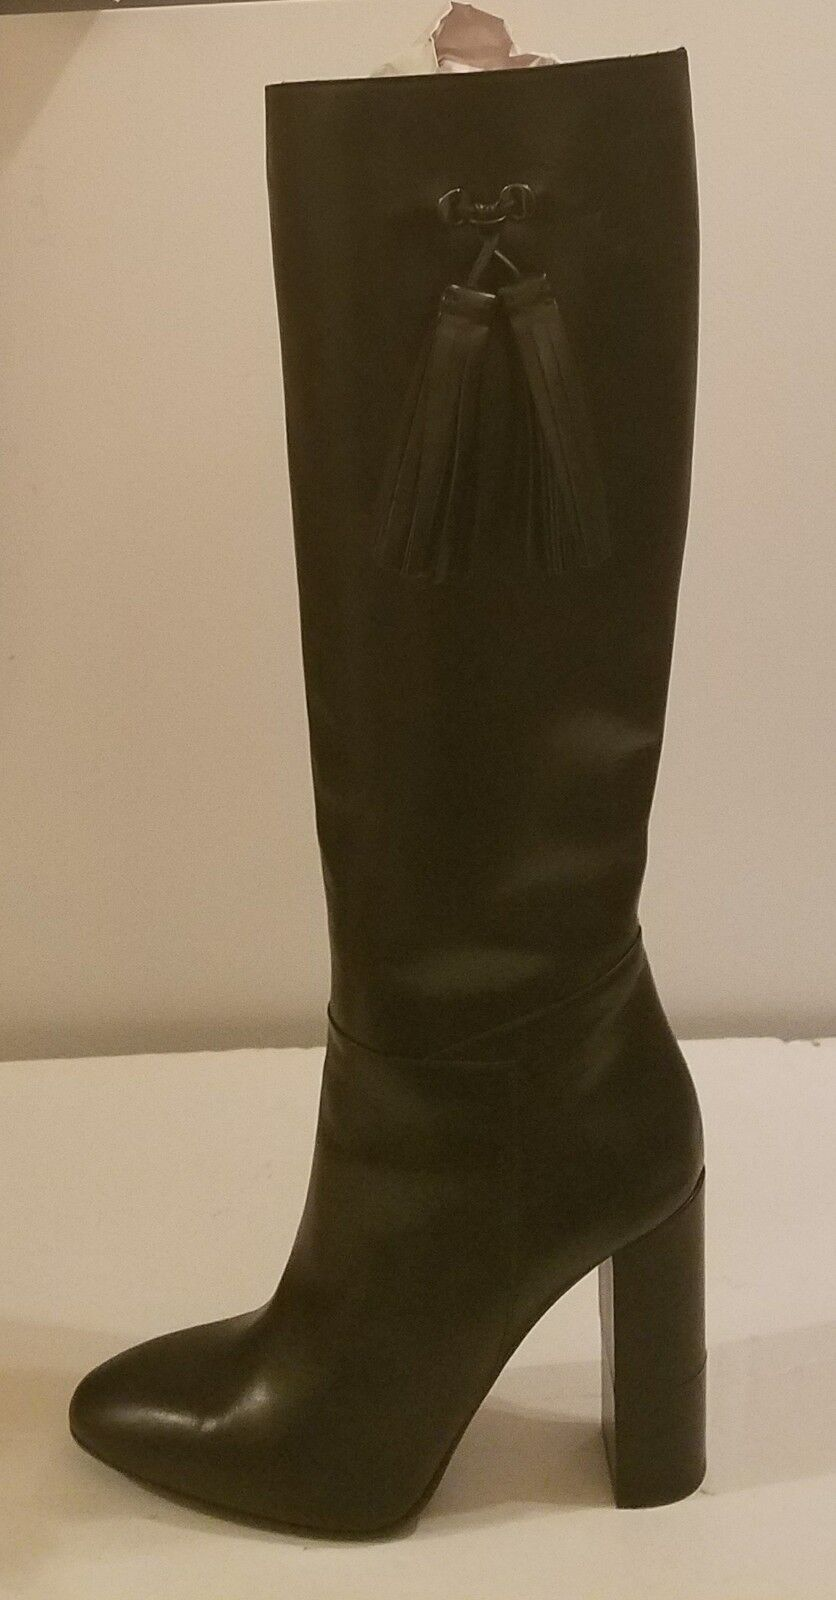 Aquatalia Evelina Knee High  Tall Black Boots Sz 10